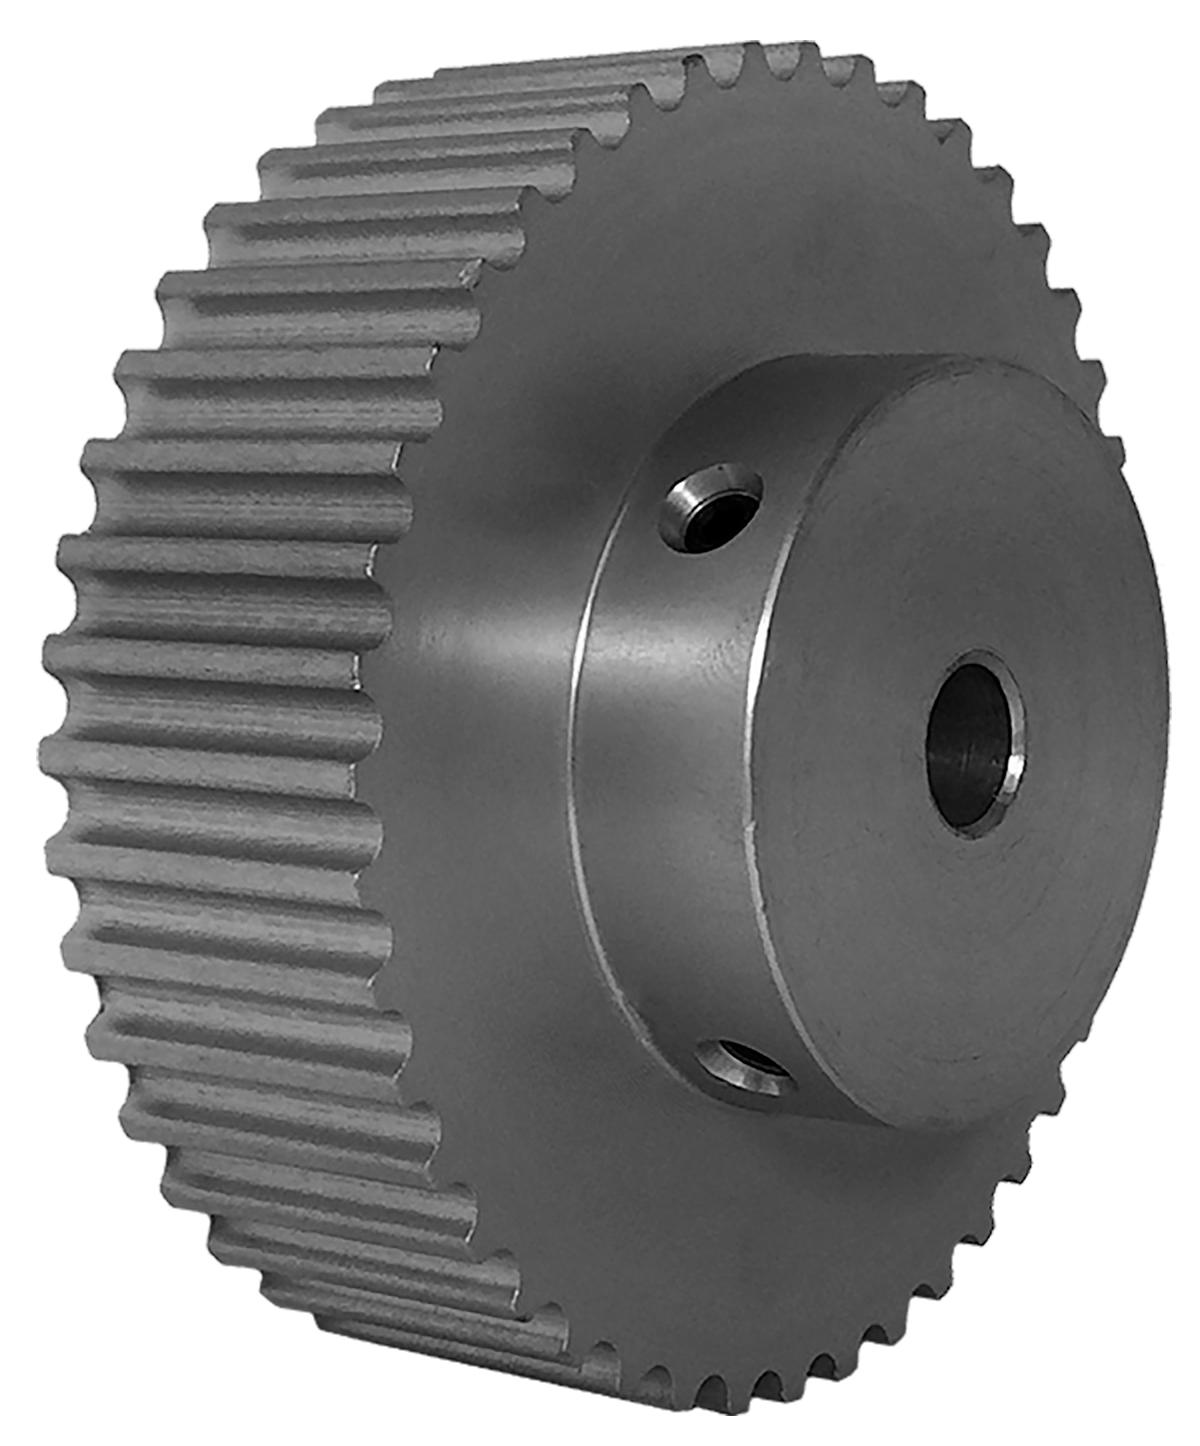 44-5P15-6A4 - Aluminum Powerhouse® Pulleys